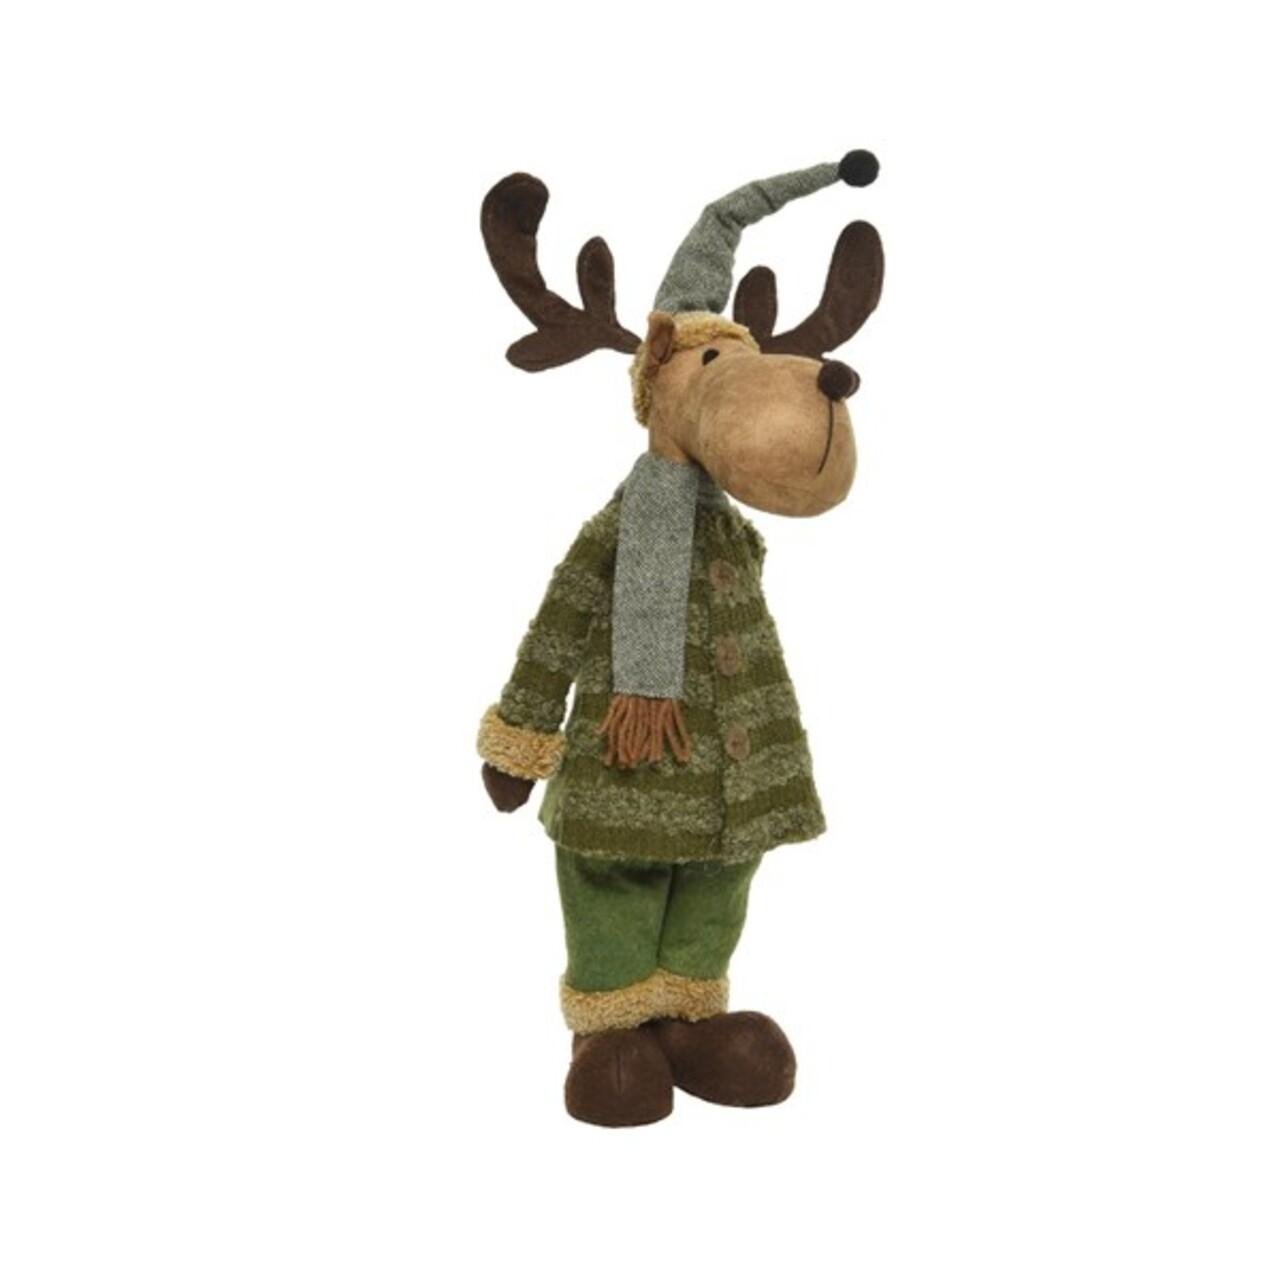 Decoratiune Deer w hat w scarf, Decoris, 16x29x67 cm, poliester, maro/verde